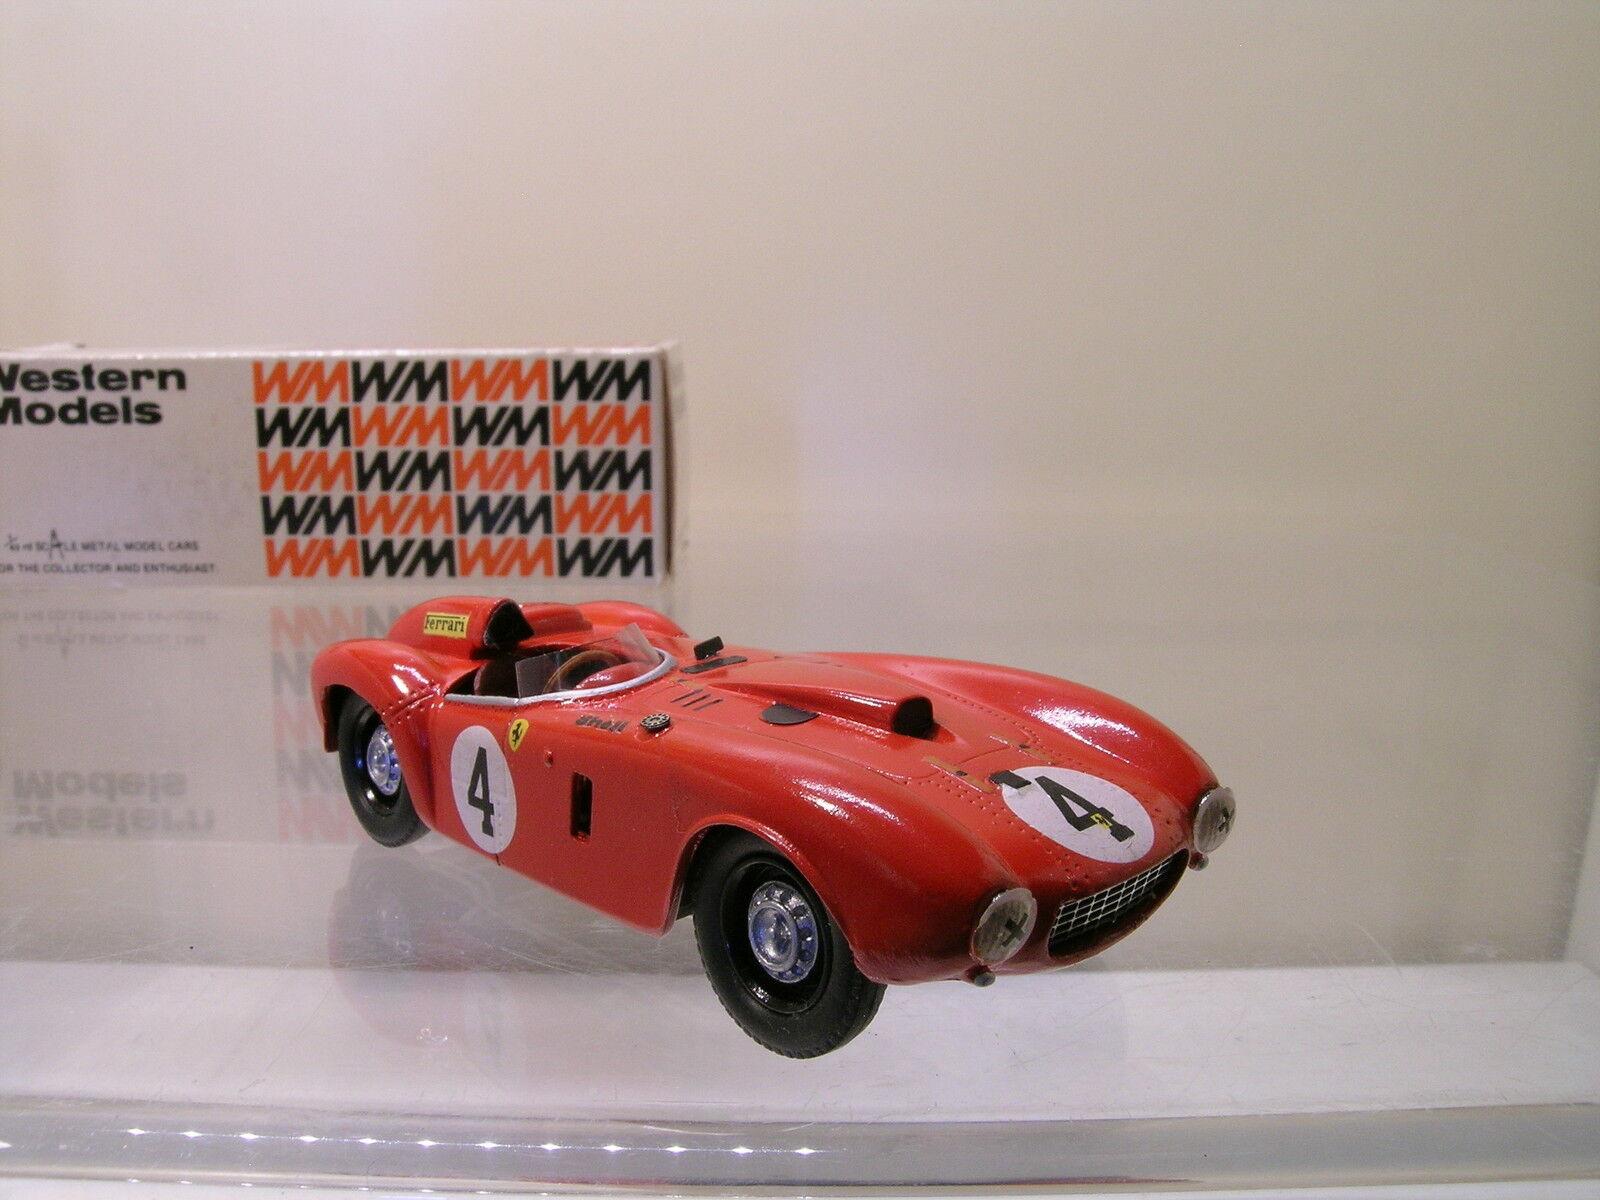 WESTERN MODELS WRK40 FERRARI 375 PLUS WINNER LM 4 1954 RED+ BOX 1 43